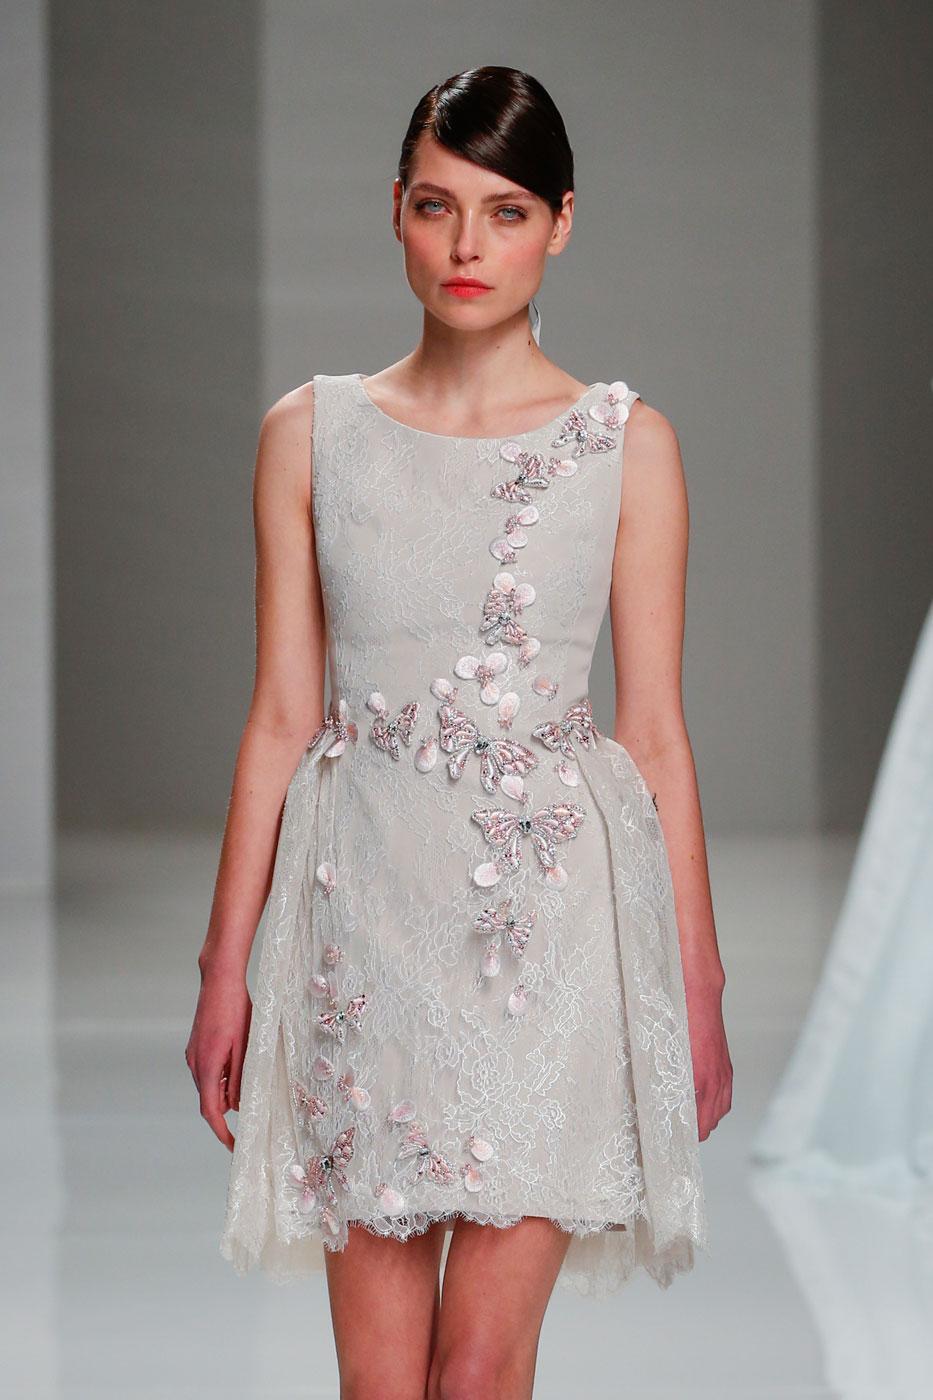 Georges-Hobeika-fashion-runway-show-haute-couture-paris-spring-2015-the-impression-64